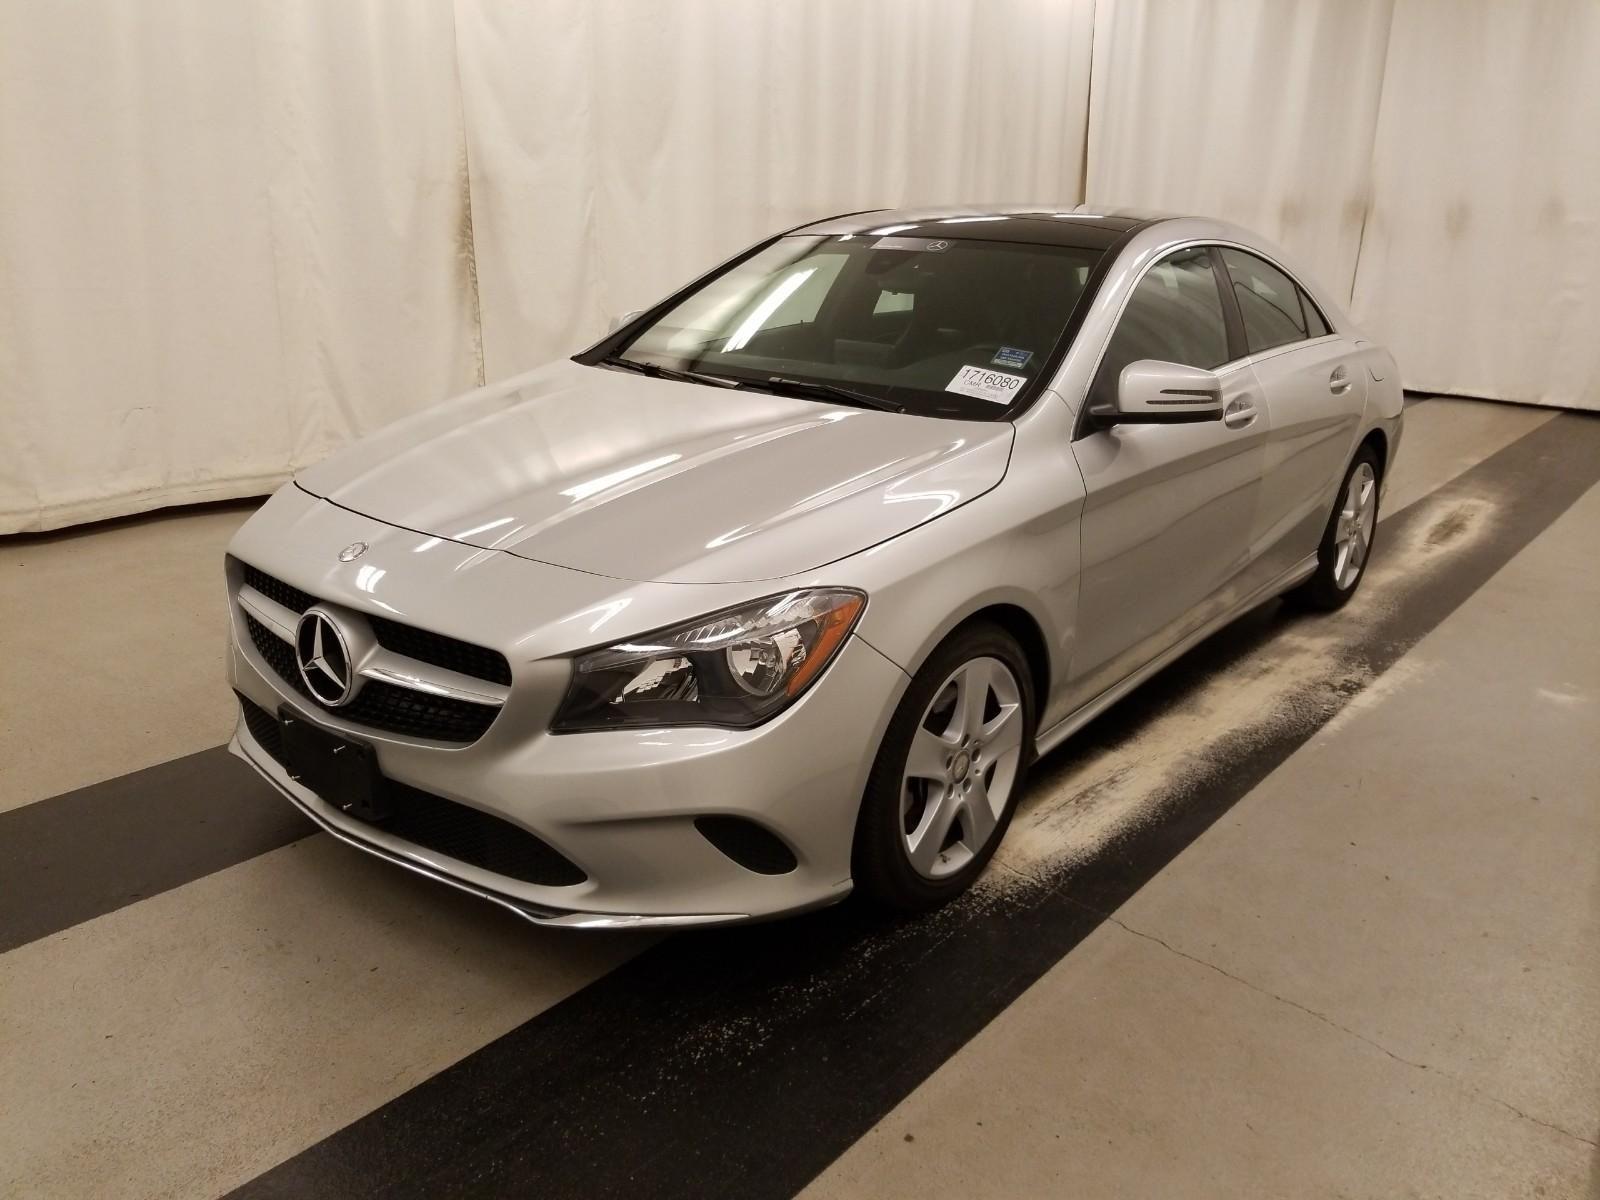 2017 Mercedes-benz Cla 2.0. Lot 99912175937 Vin WDDSJ4EB4HN463285